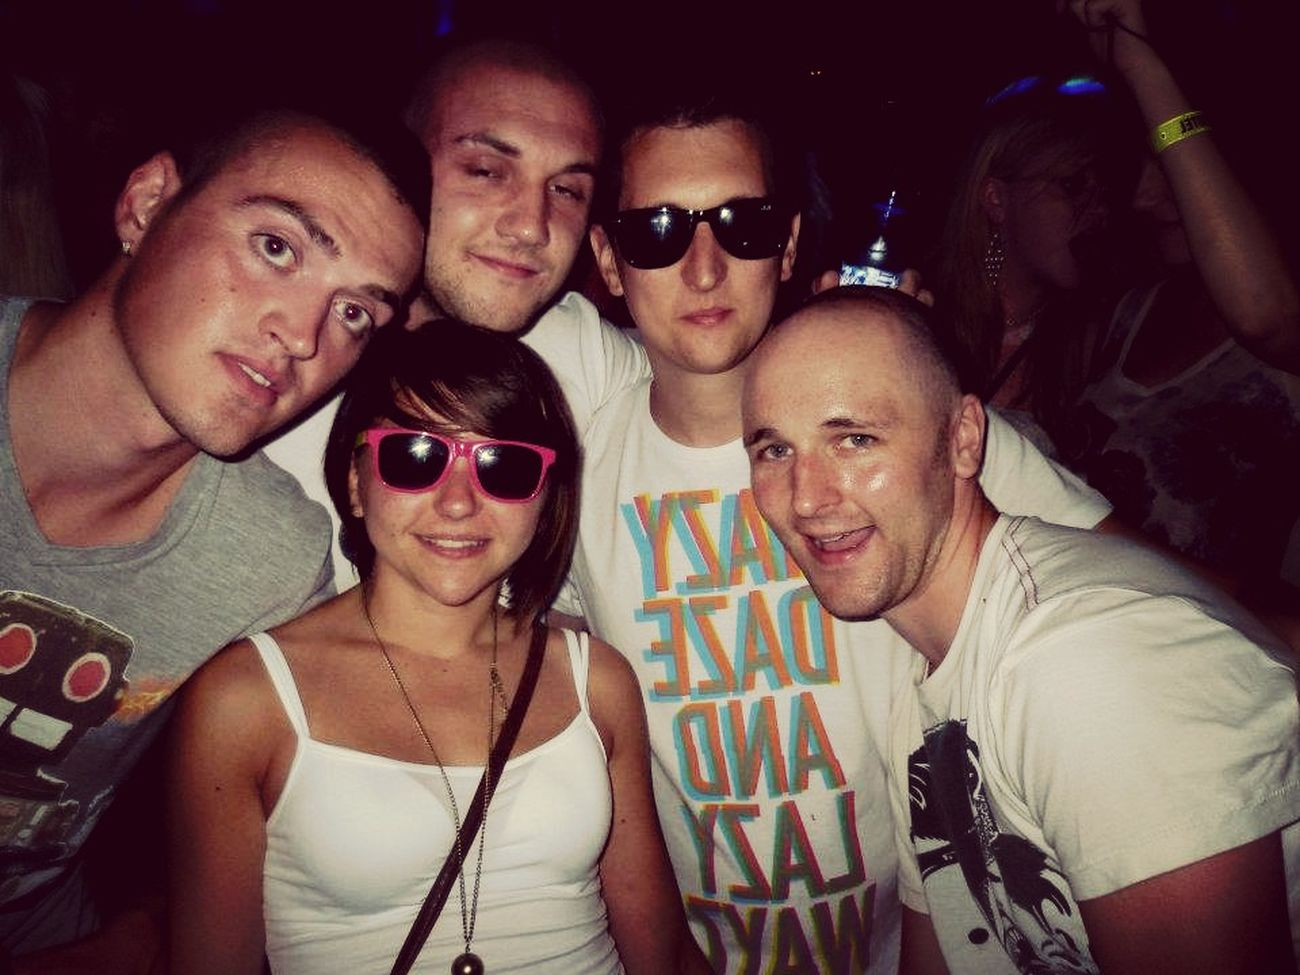 Holiday Ibiza Dance ❤